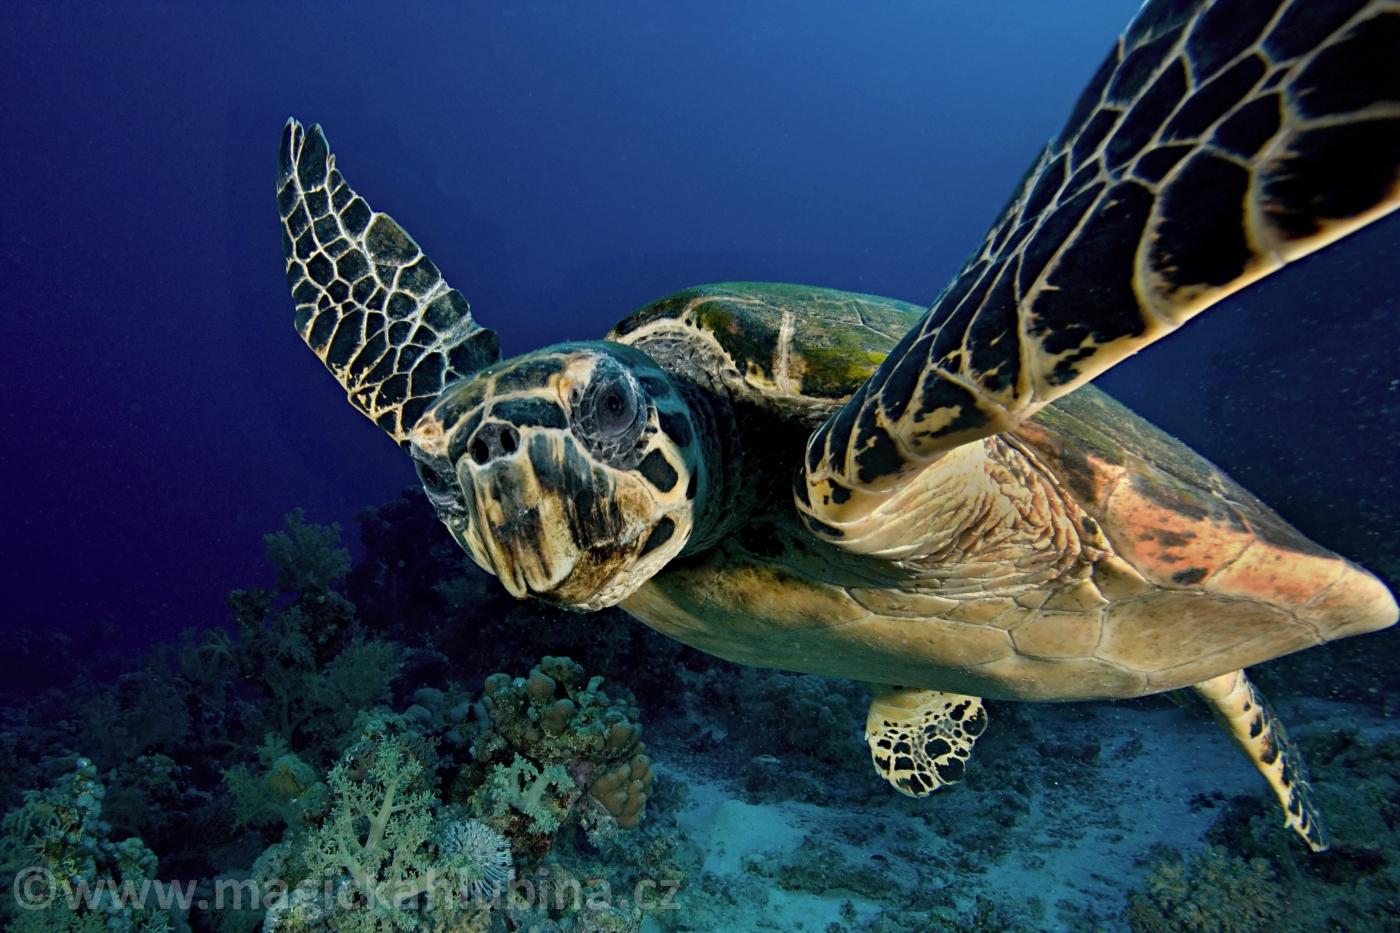 Eretmochelys_imbricata_-_Hawksbill_Sea_Turtle